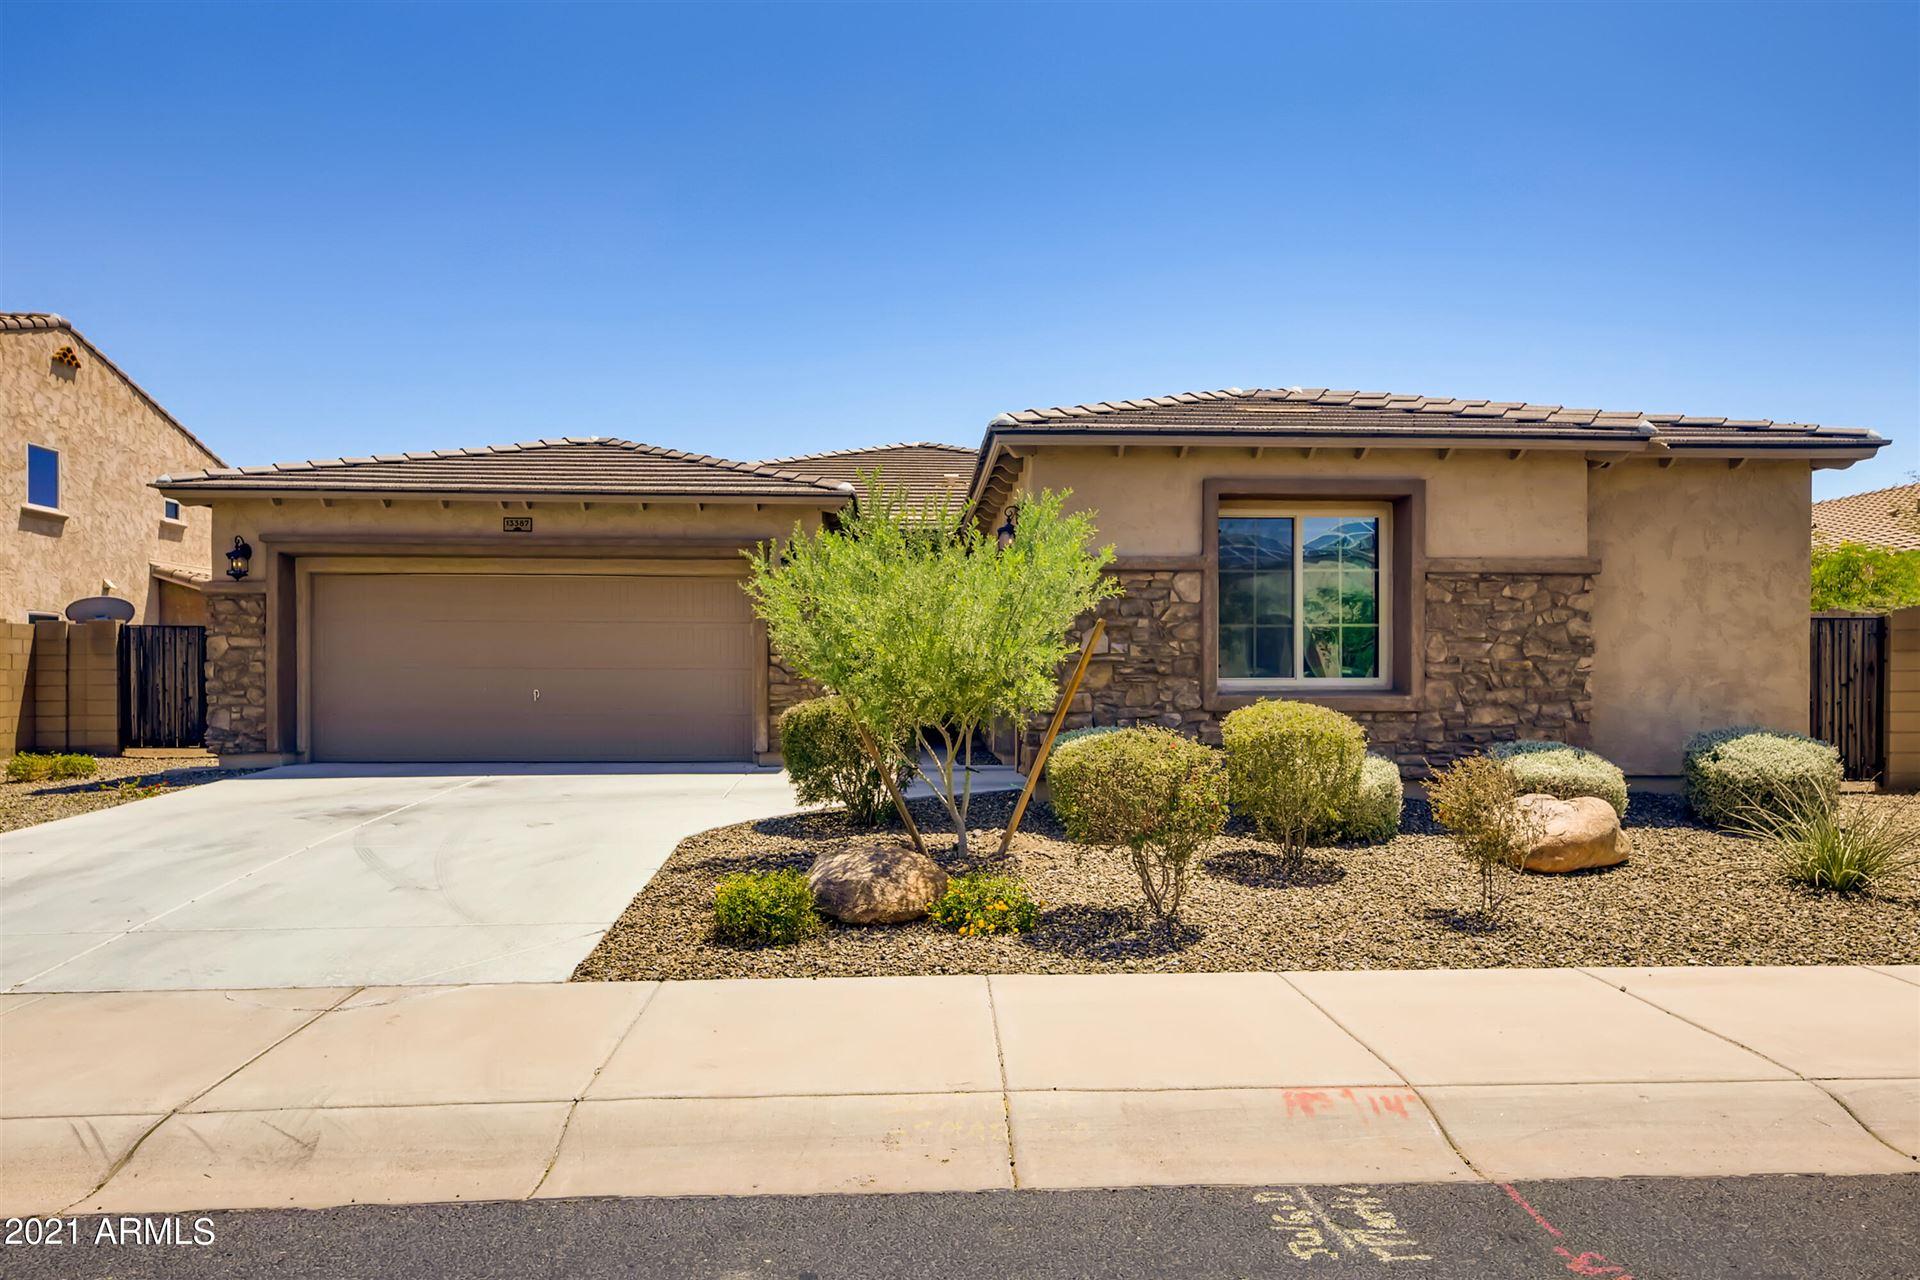 13387 W CREOSOTE Drive, Peoria, AZ 85383 - MLS#: 6262614